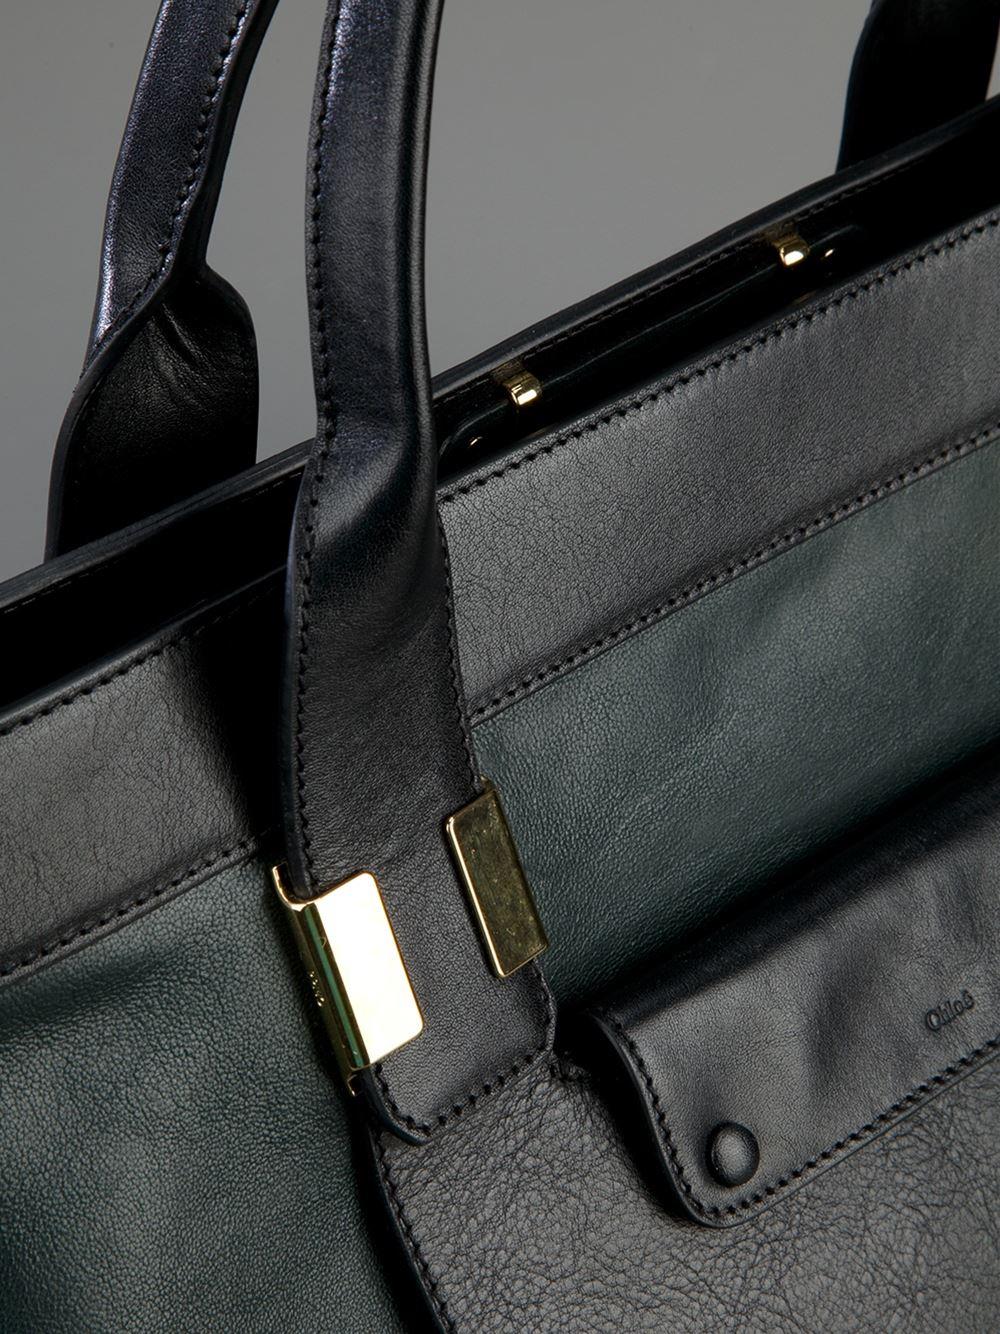 chloe saddle messenger bag - chloe large alice tote, cheap replica chloe handbags